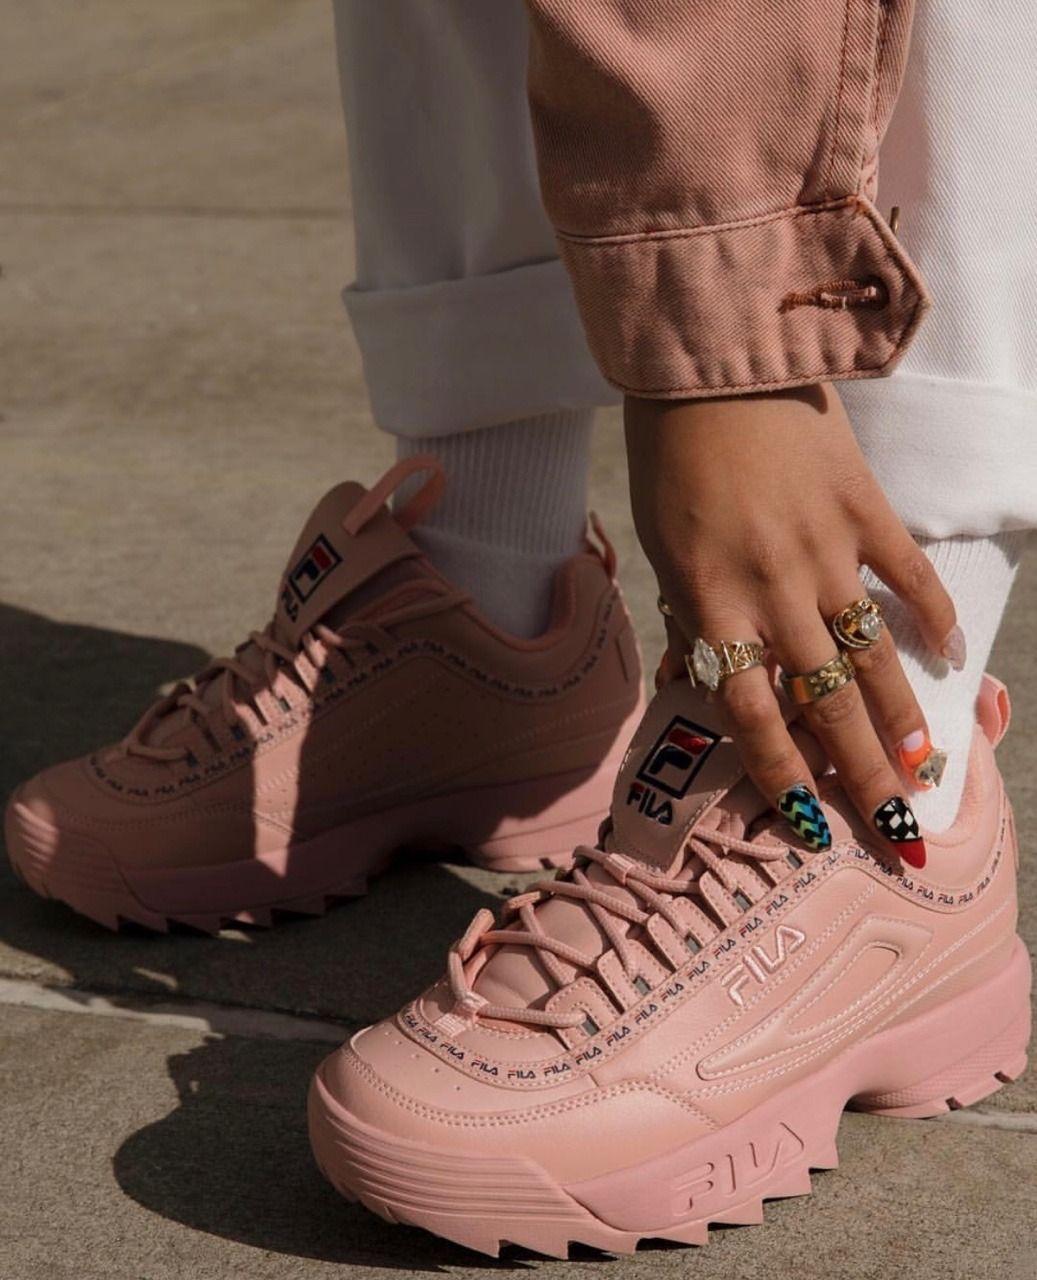 astra 3 colors  zapatos nike mujer zapatos tenis para